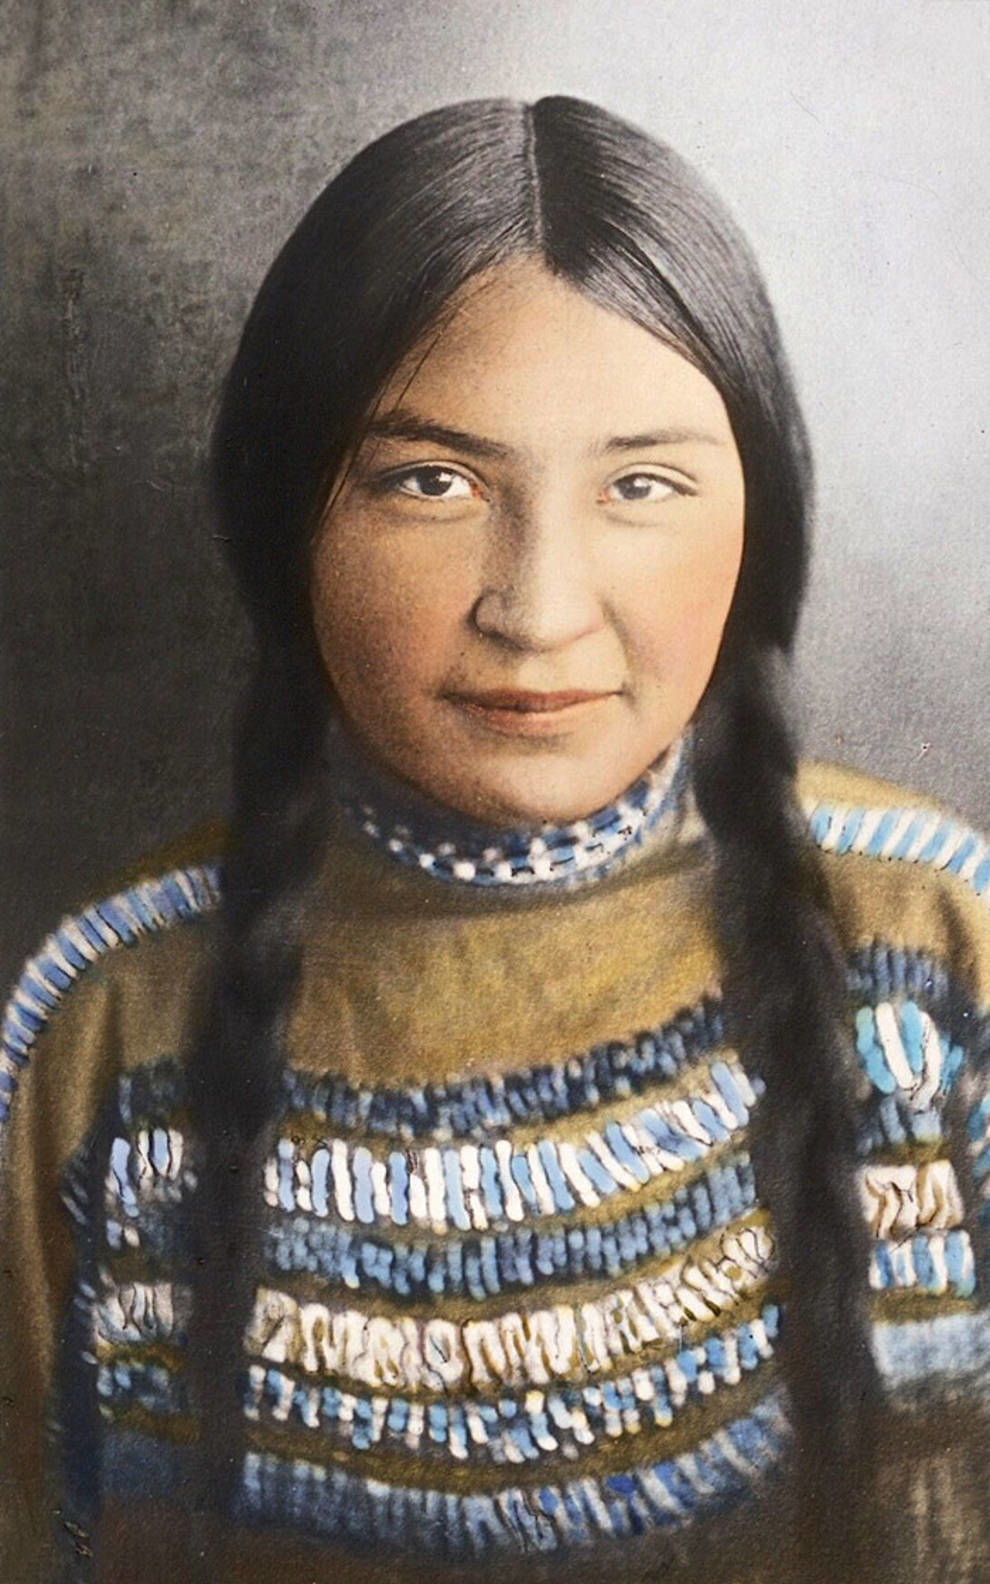 Фотографии индейцев конца XIX века в цвете